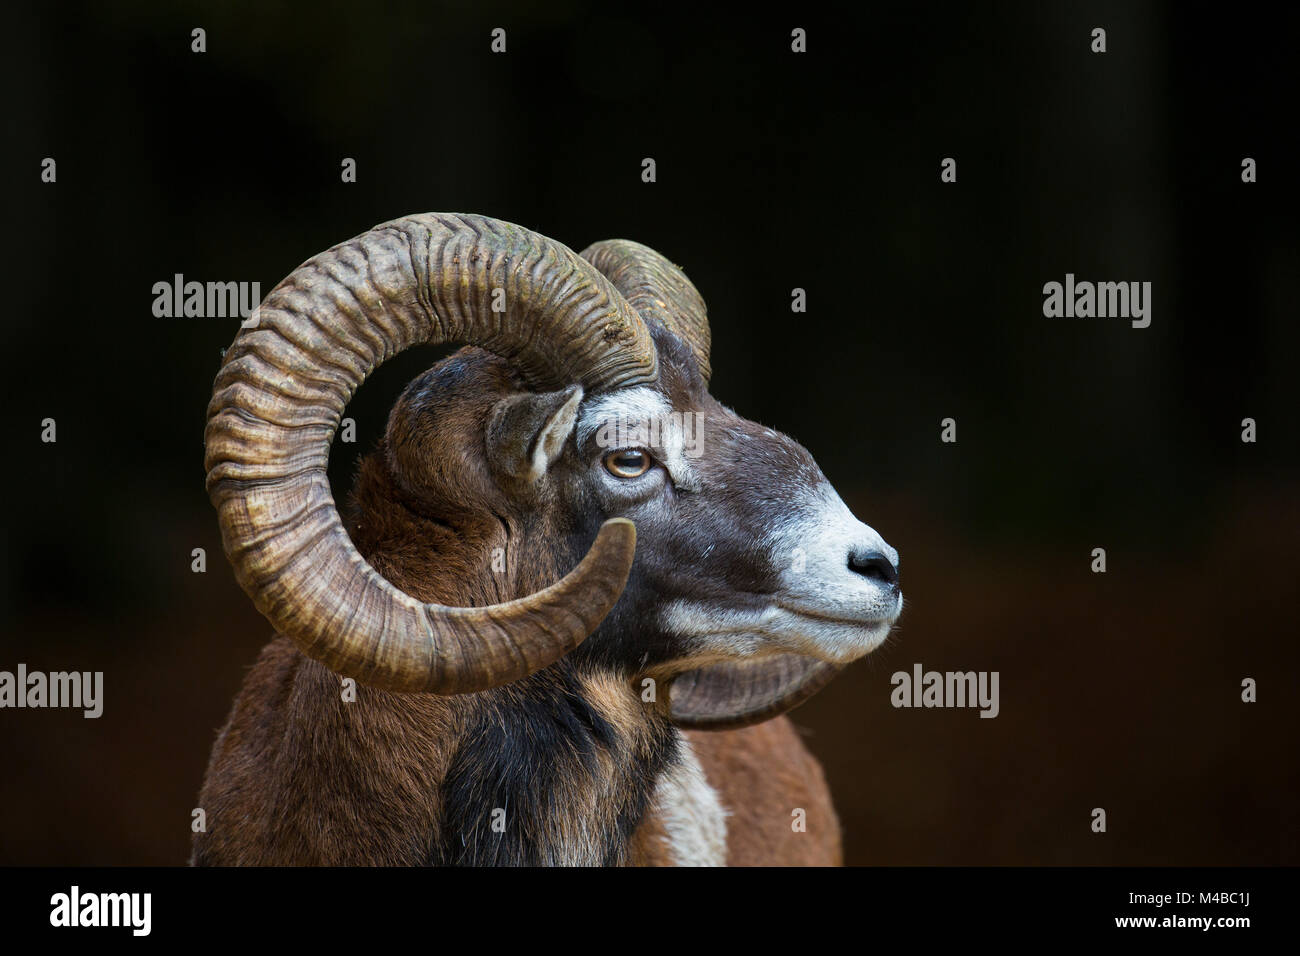 Mouflon (Ovis gmelini européenne / Ovis ammon musimon / Ovis orientalis musimon) portrait de ram avec de grandes Photo Stock